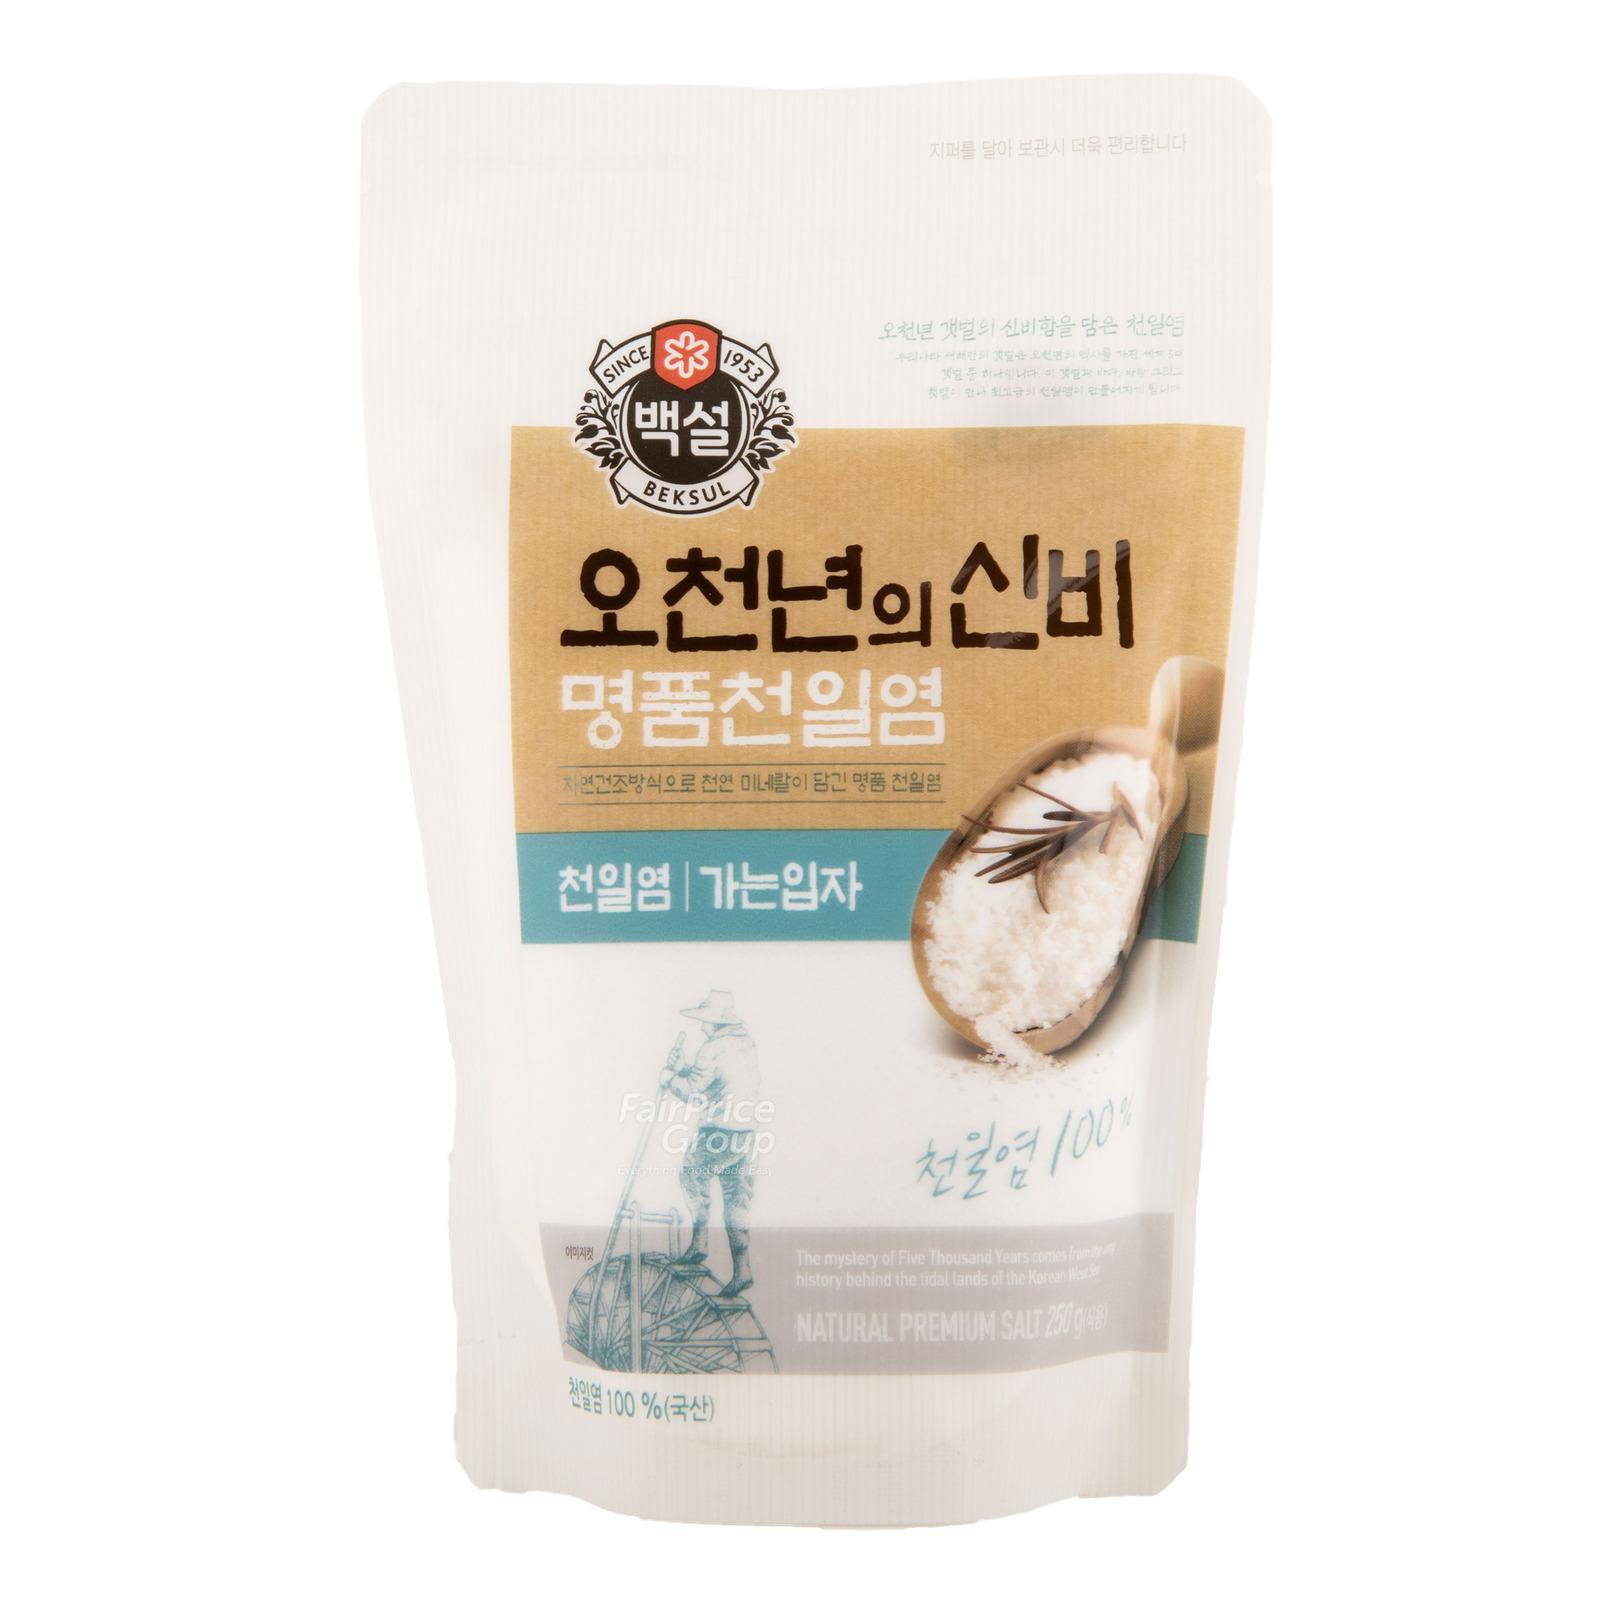 CJ Beksul Natural Premium Sea Salt